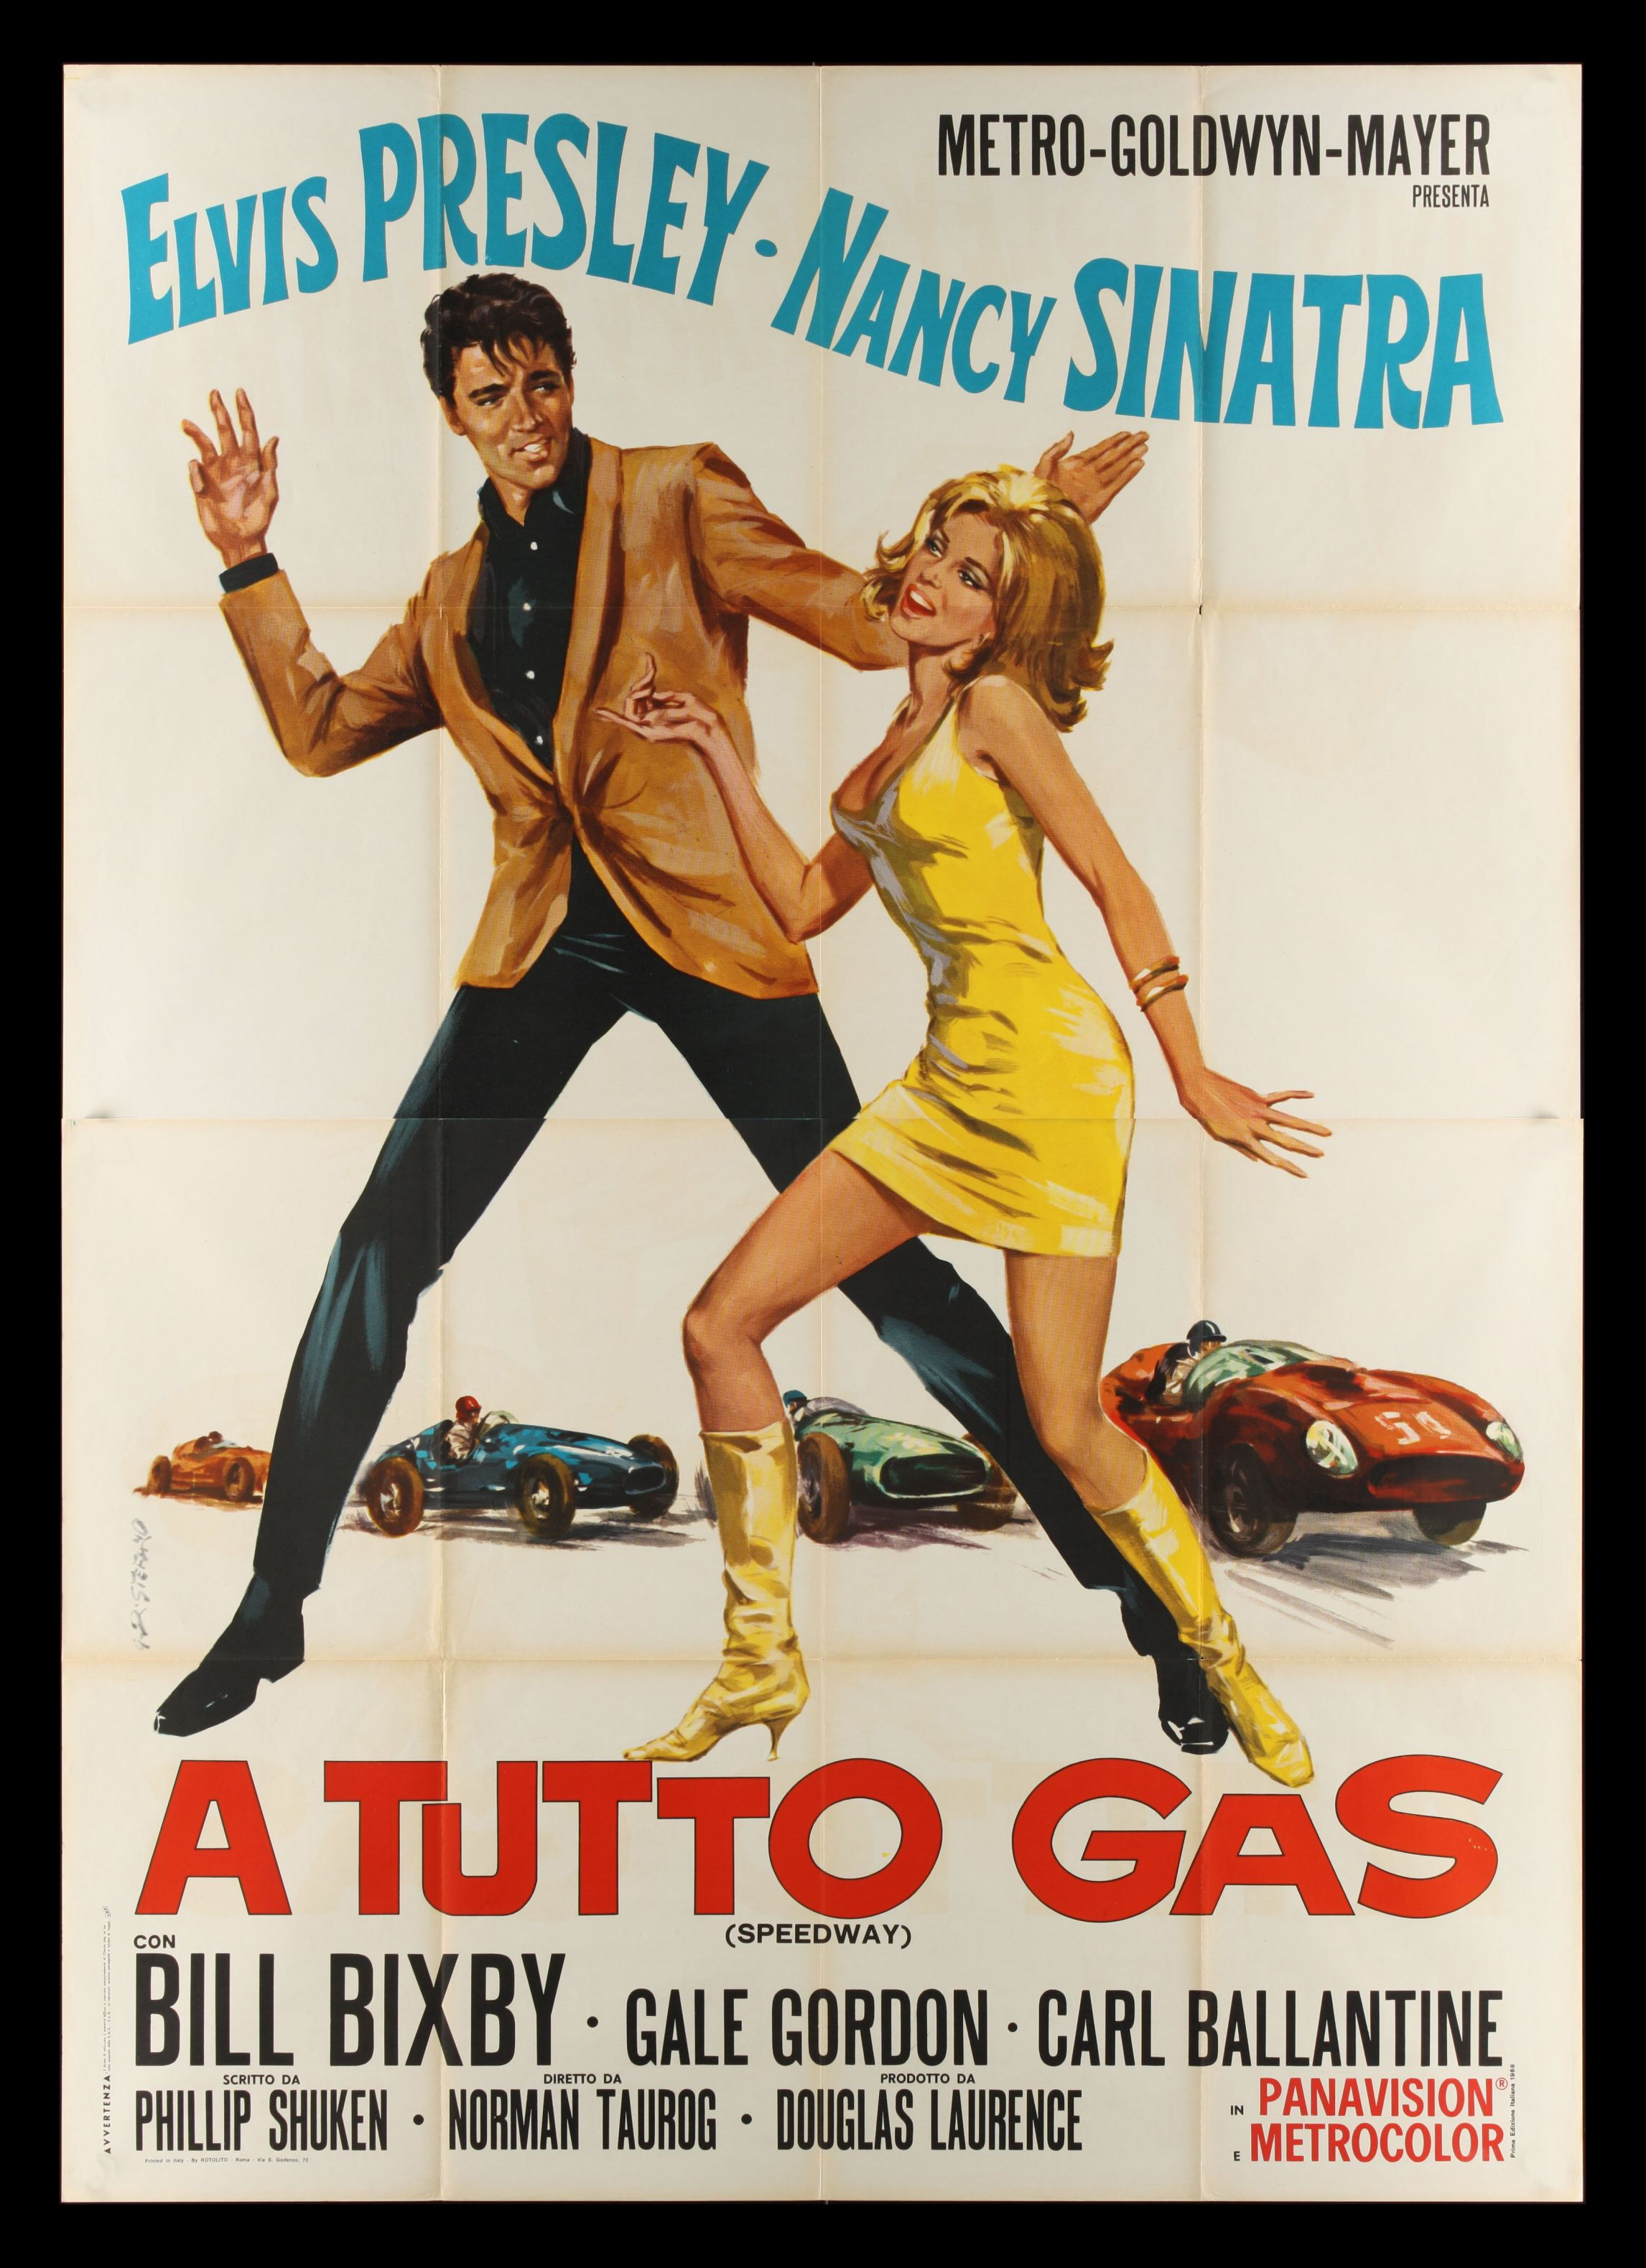 6f23d0232510e 60s italian movie posters | Elvis Movie Posters * Original Elvis ...